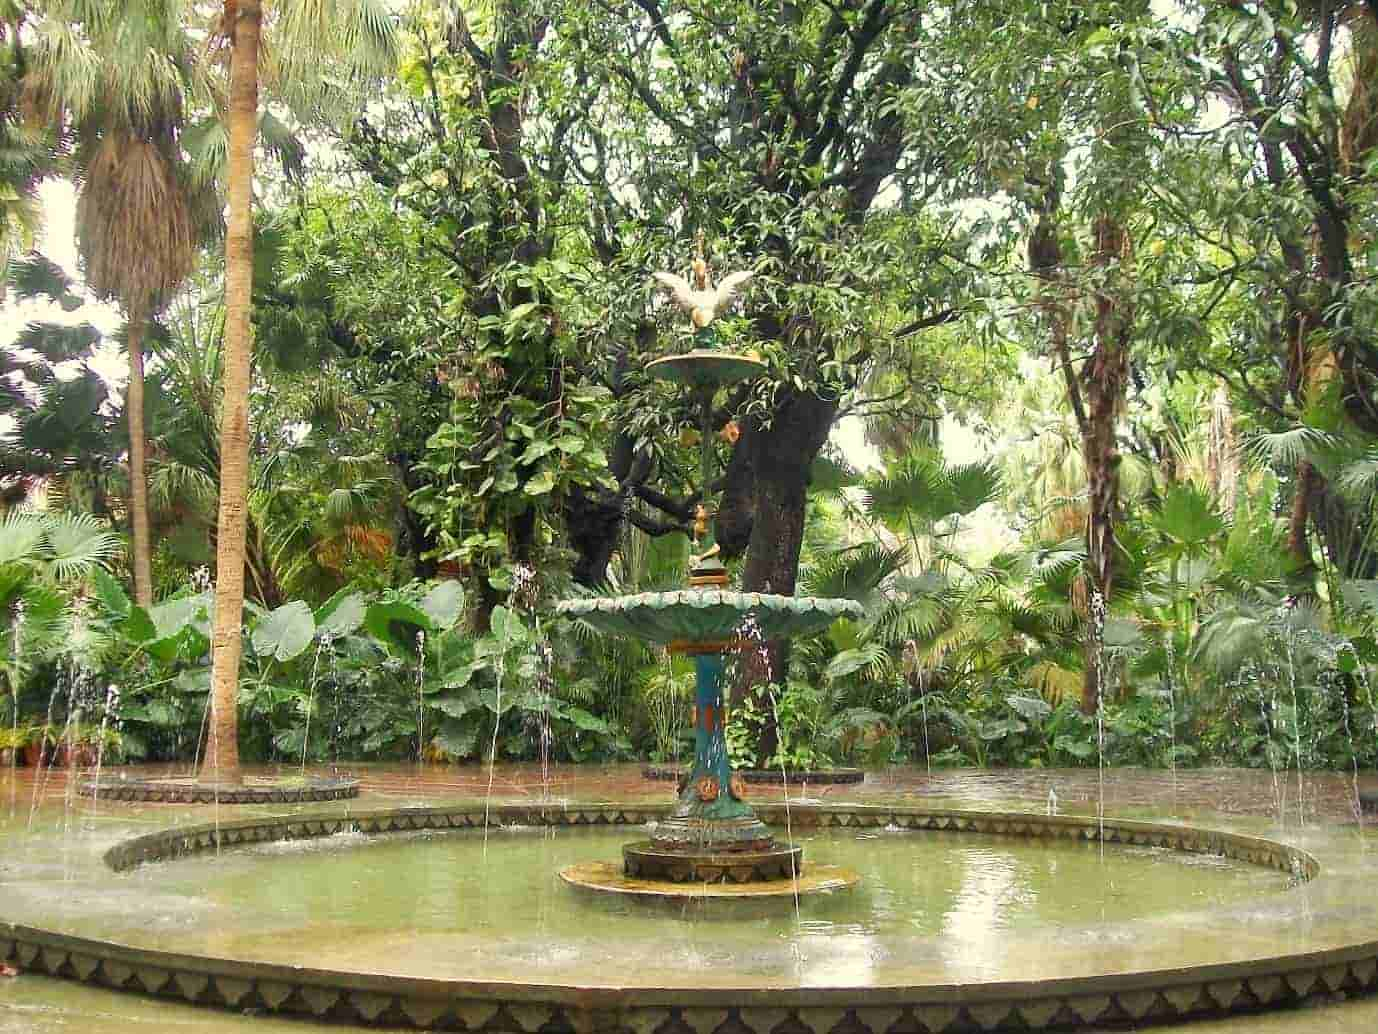 Saheliyon-Ki-Bari-is-a-beautiful-garden-with-exotic-fountains